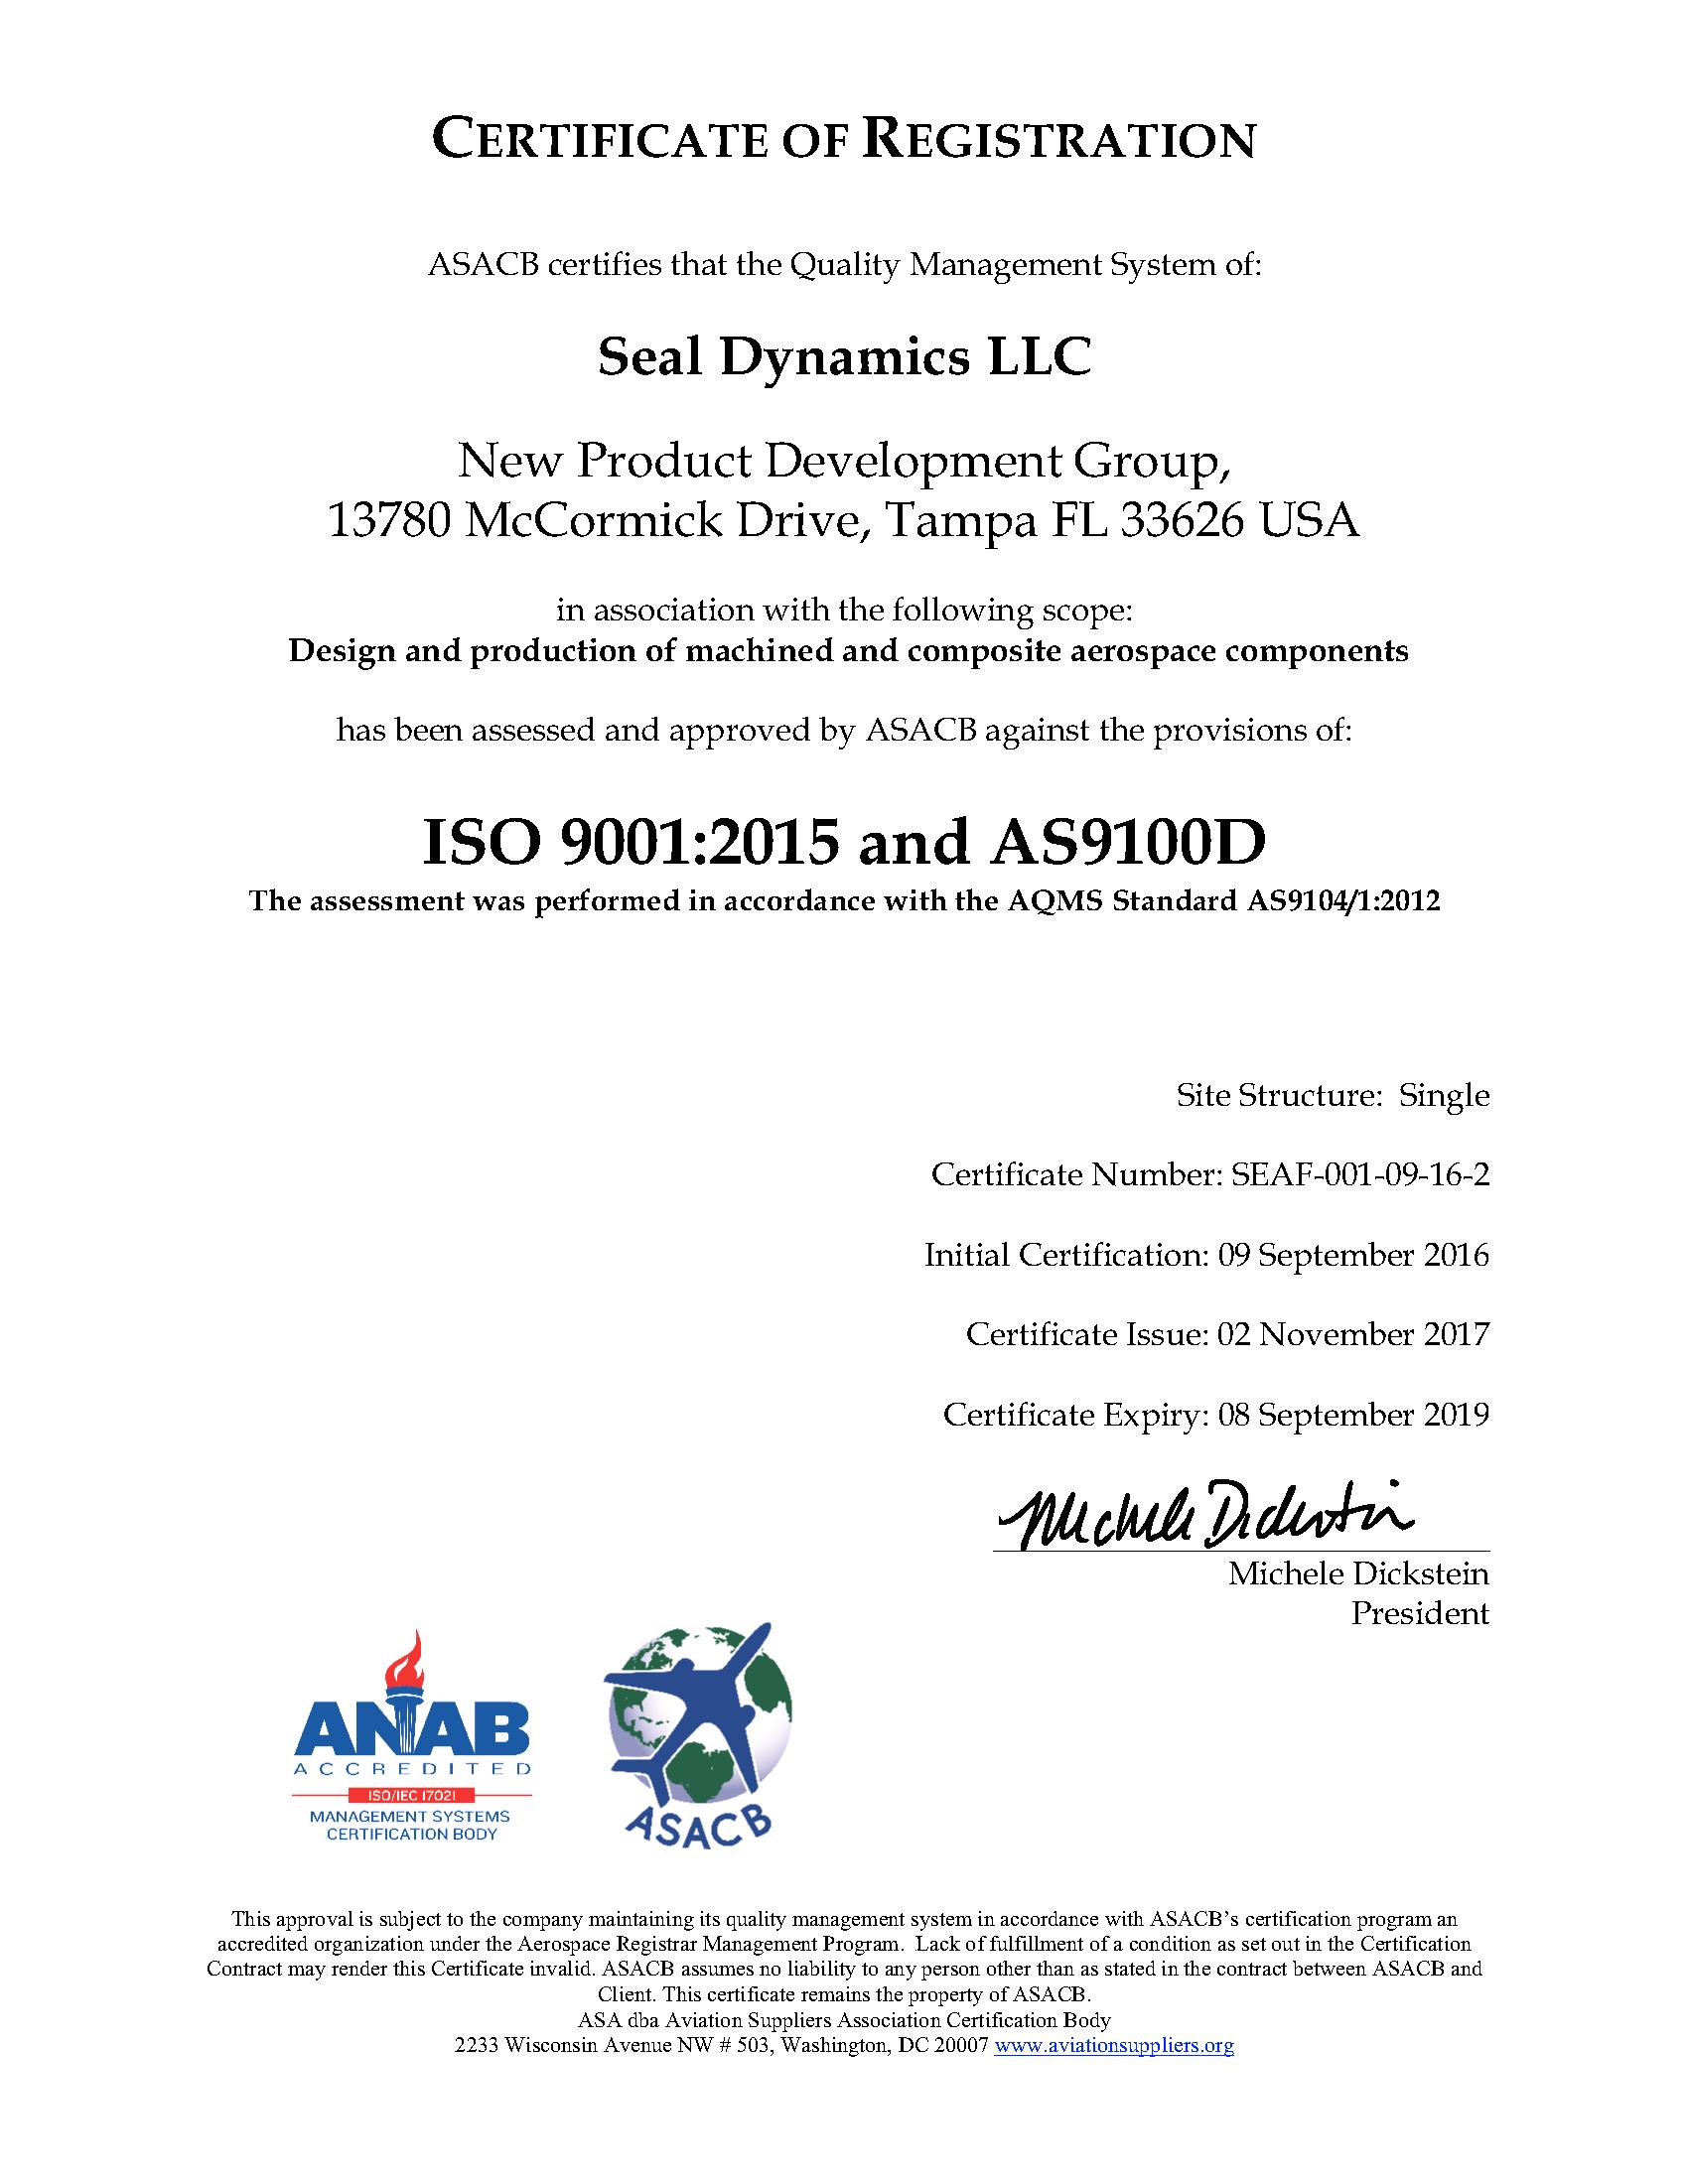 Seal Dynamics Certifications – Seal Dynamics